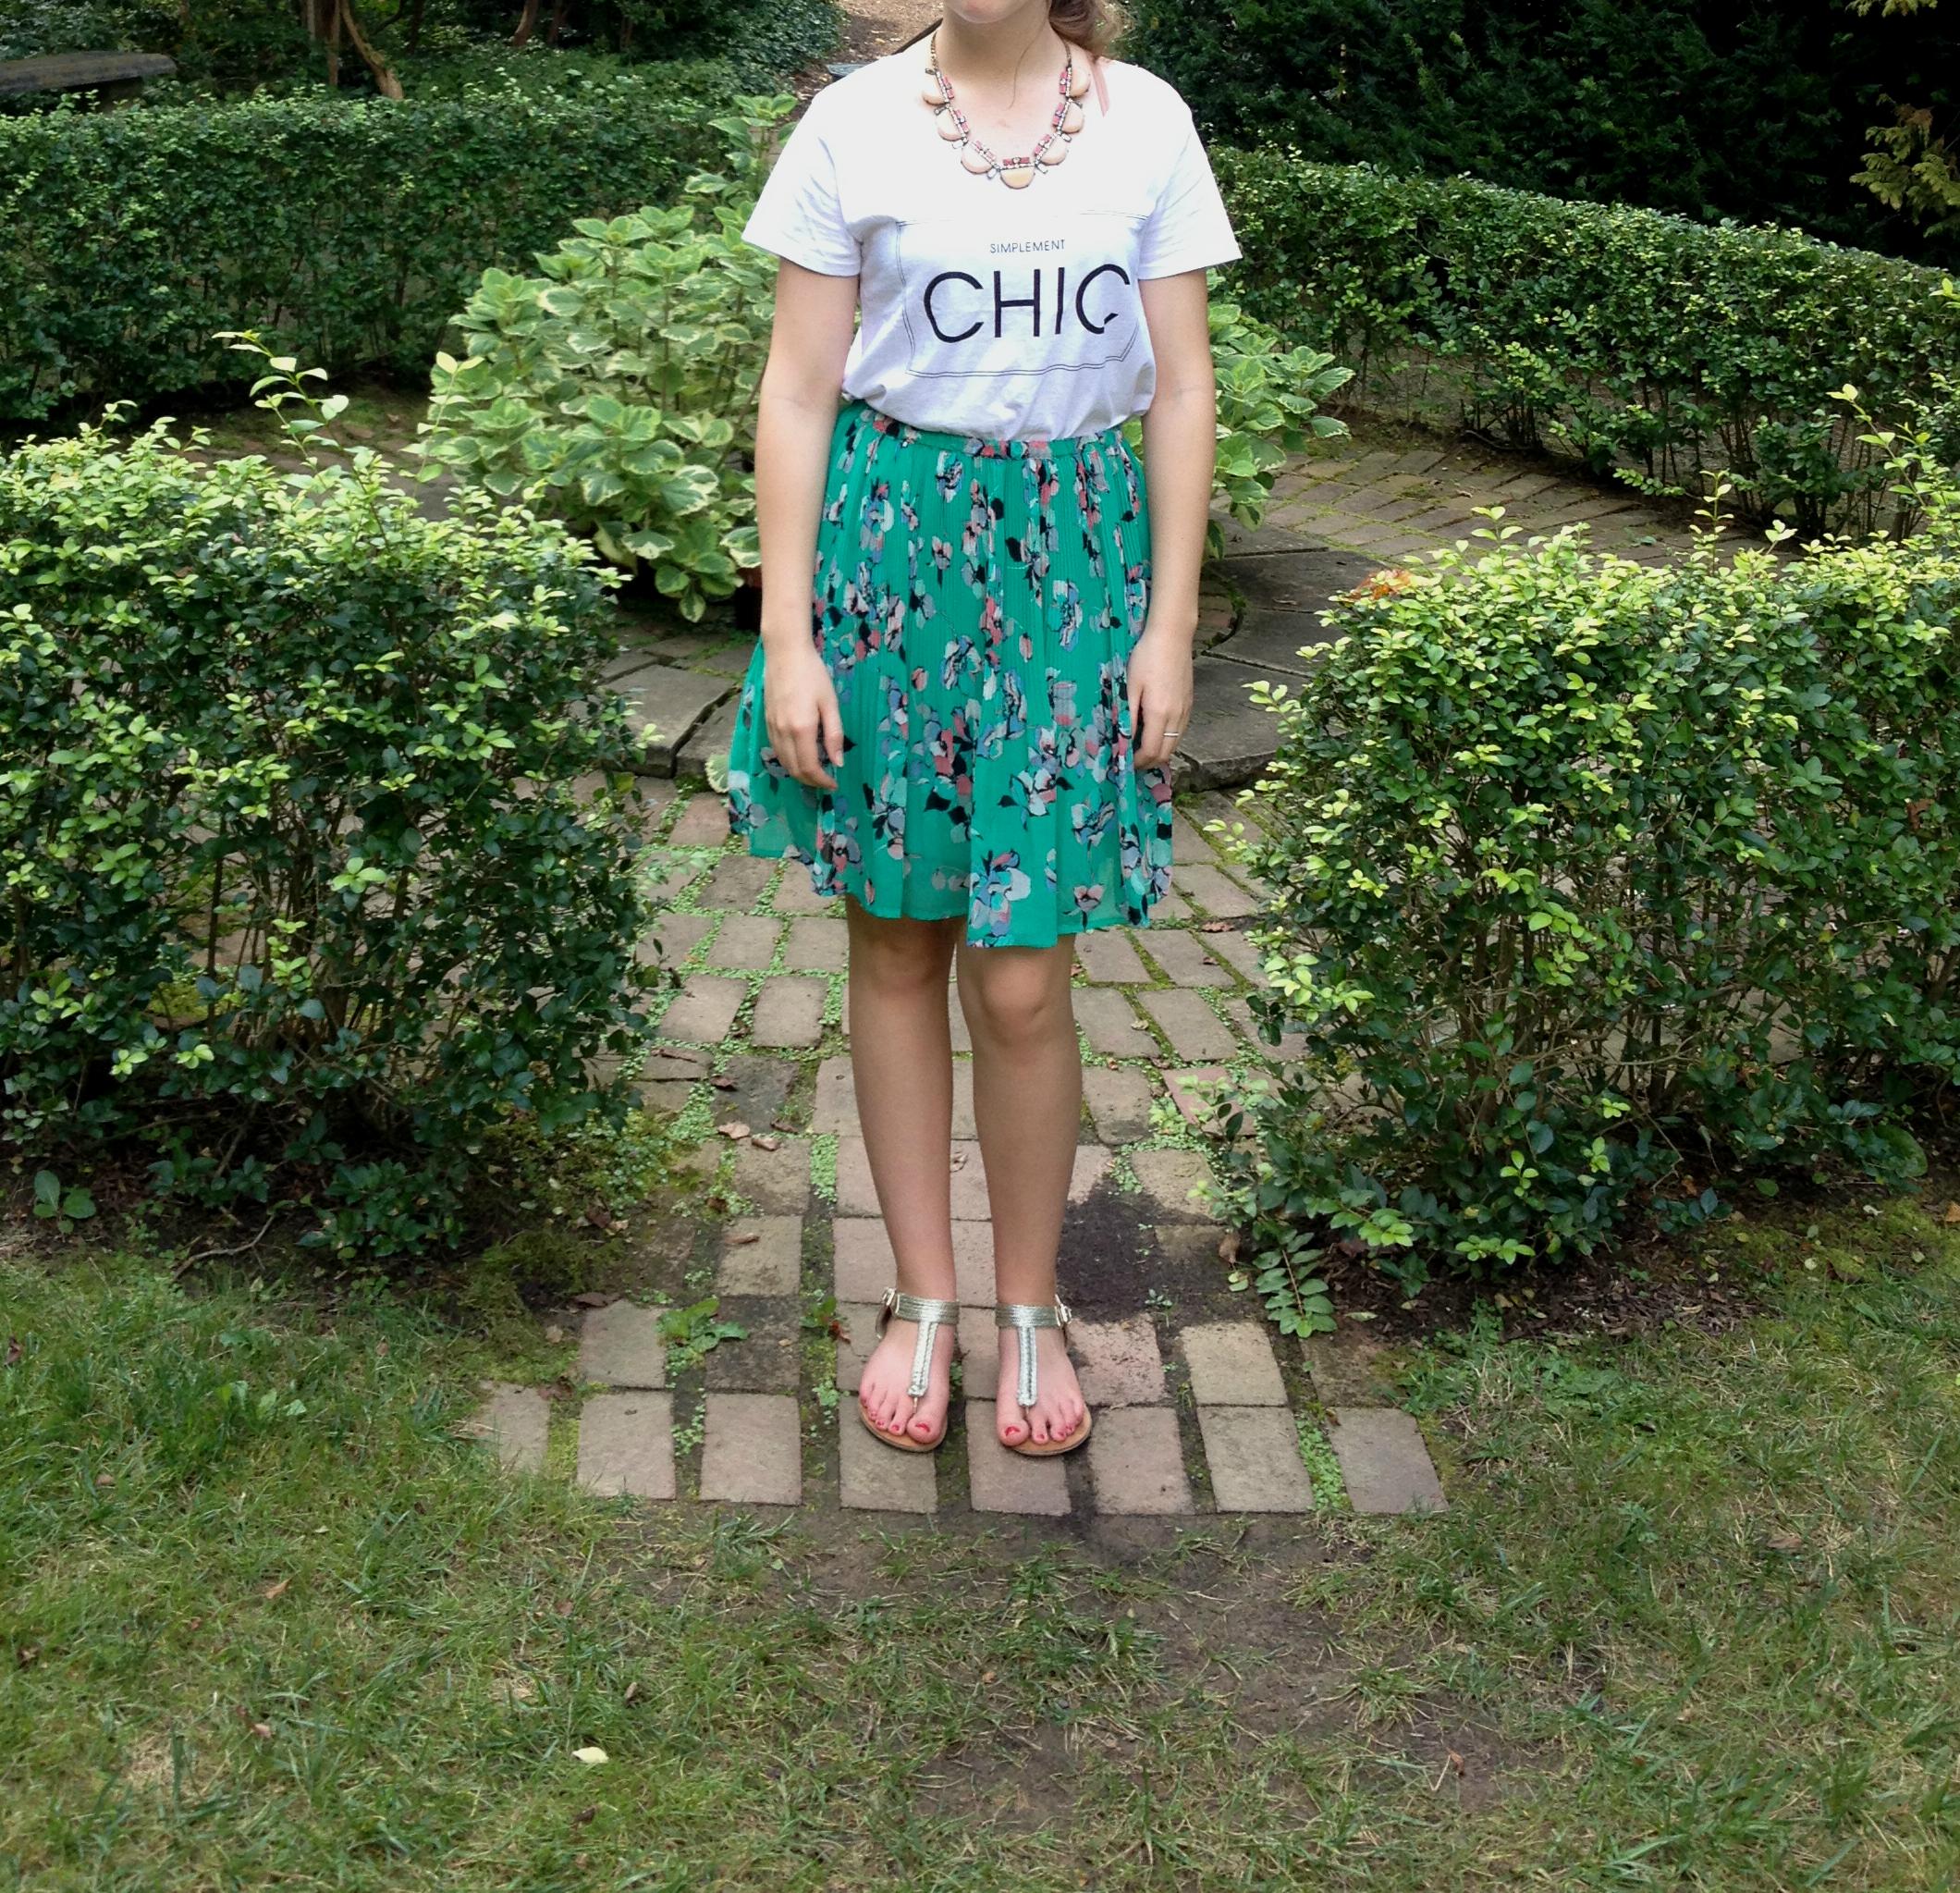 chic4_2